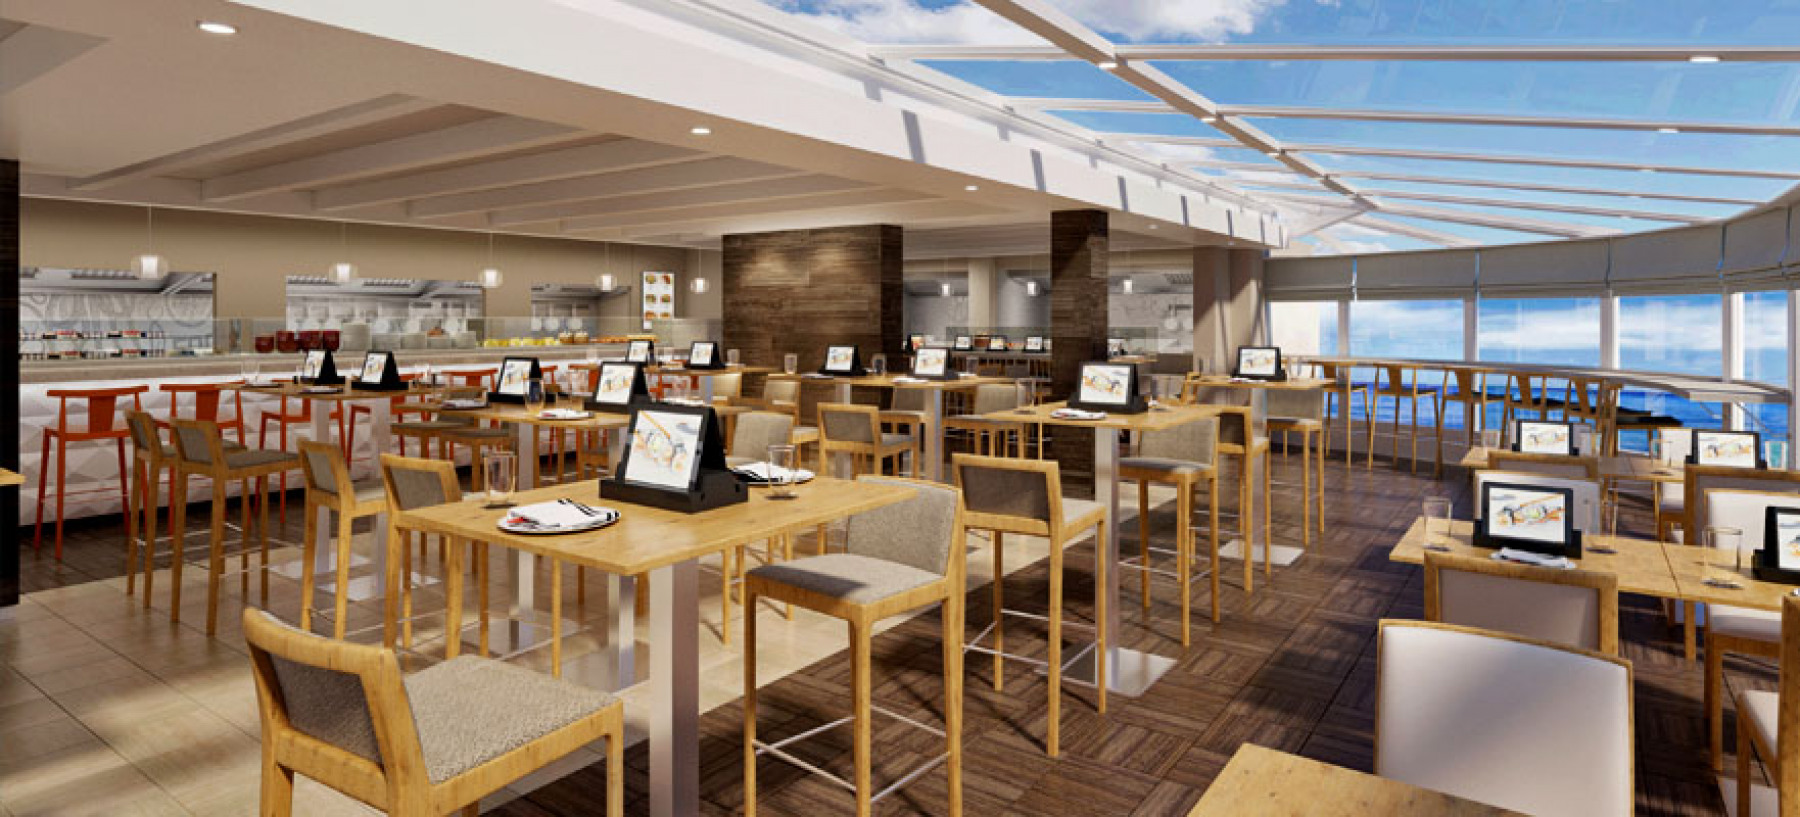 Norwegian Cruise Lines Norwegian Joy Interior Food Republic.jpg